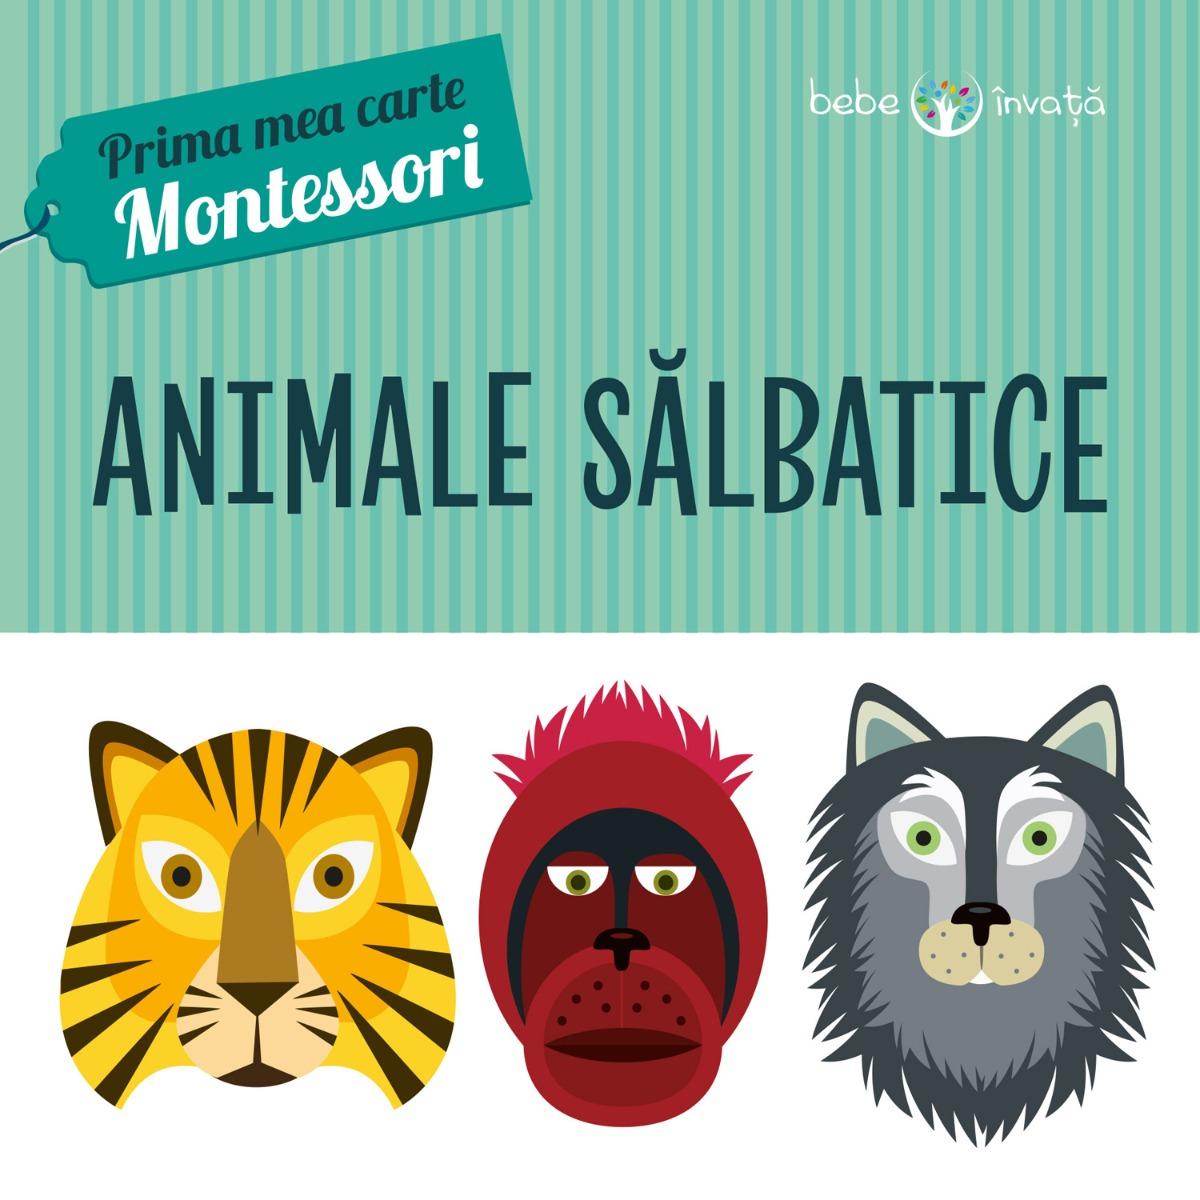 Prima mea carte Montessori - Animale Salbatice